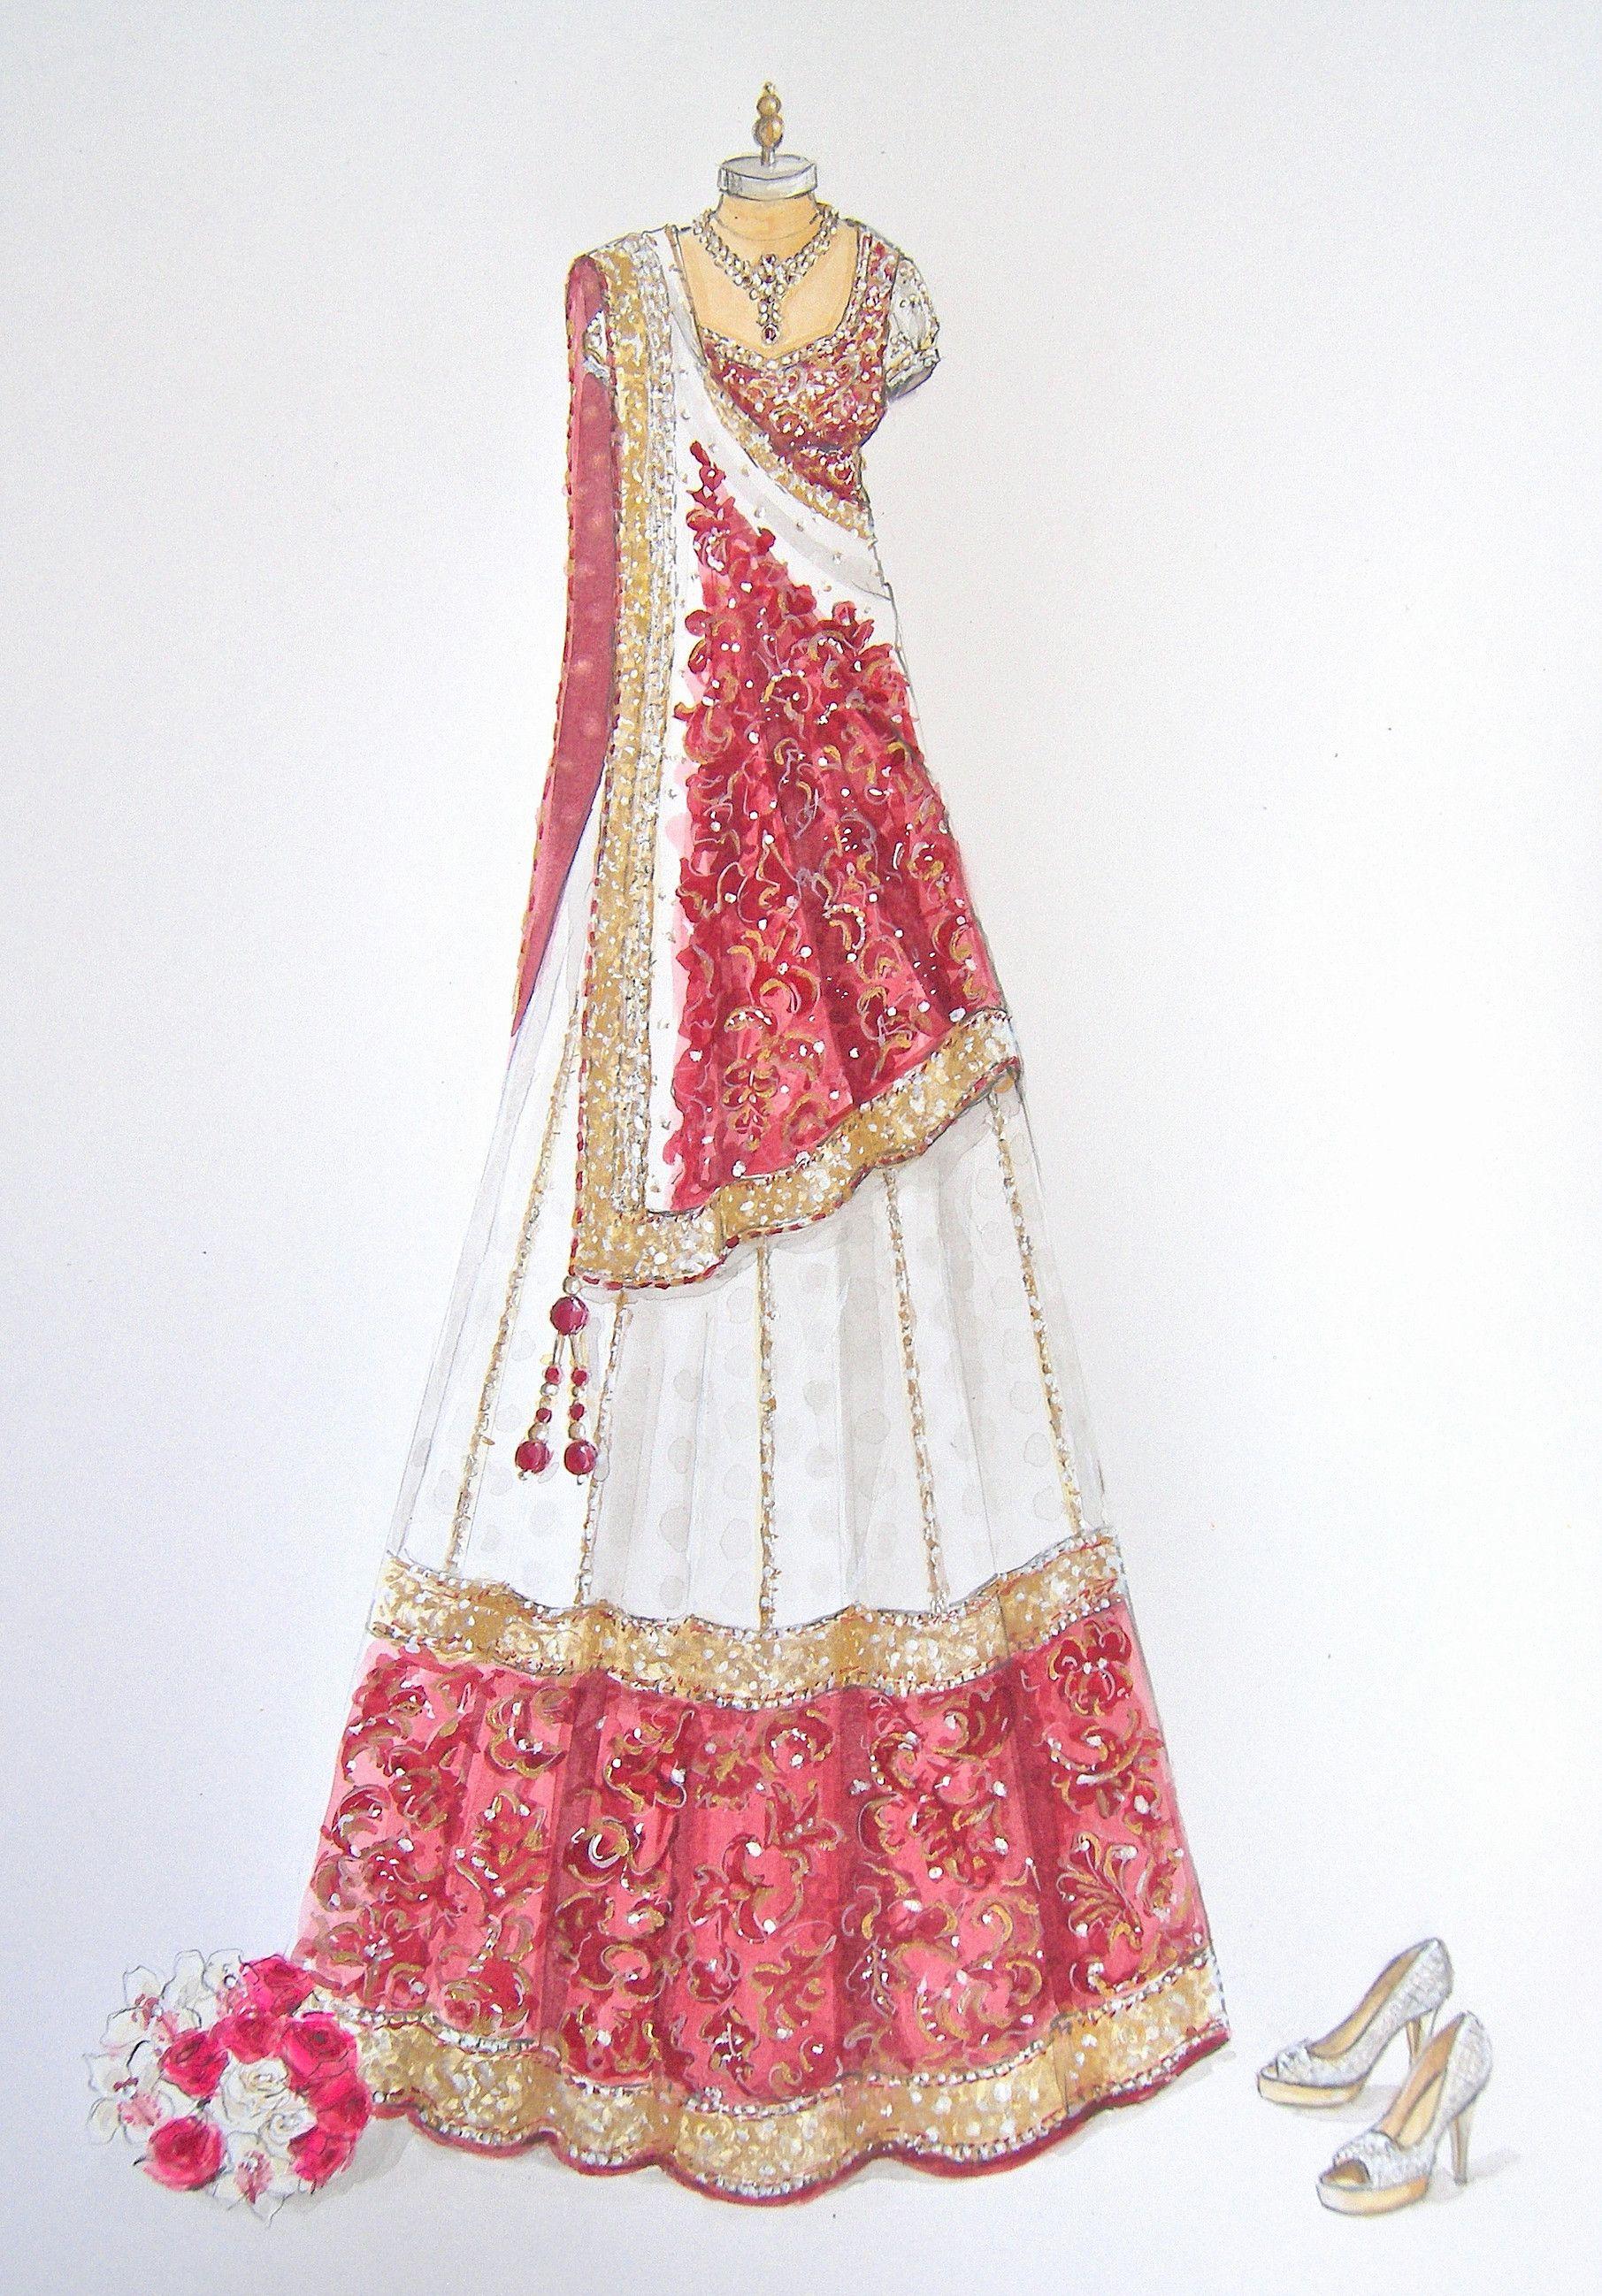 Porfolio of custom wedding dress sketches and